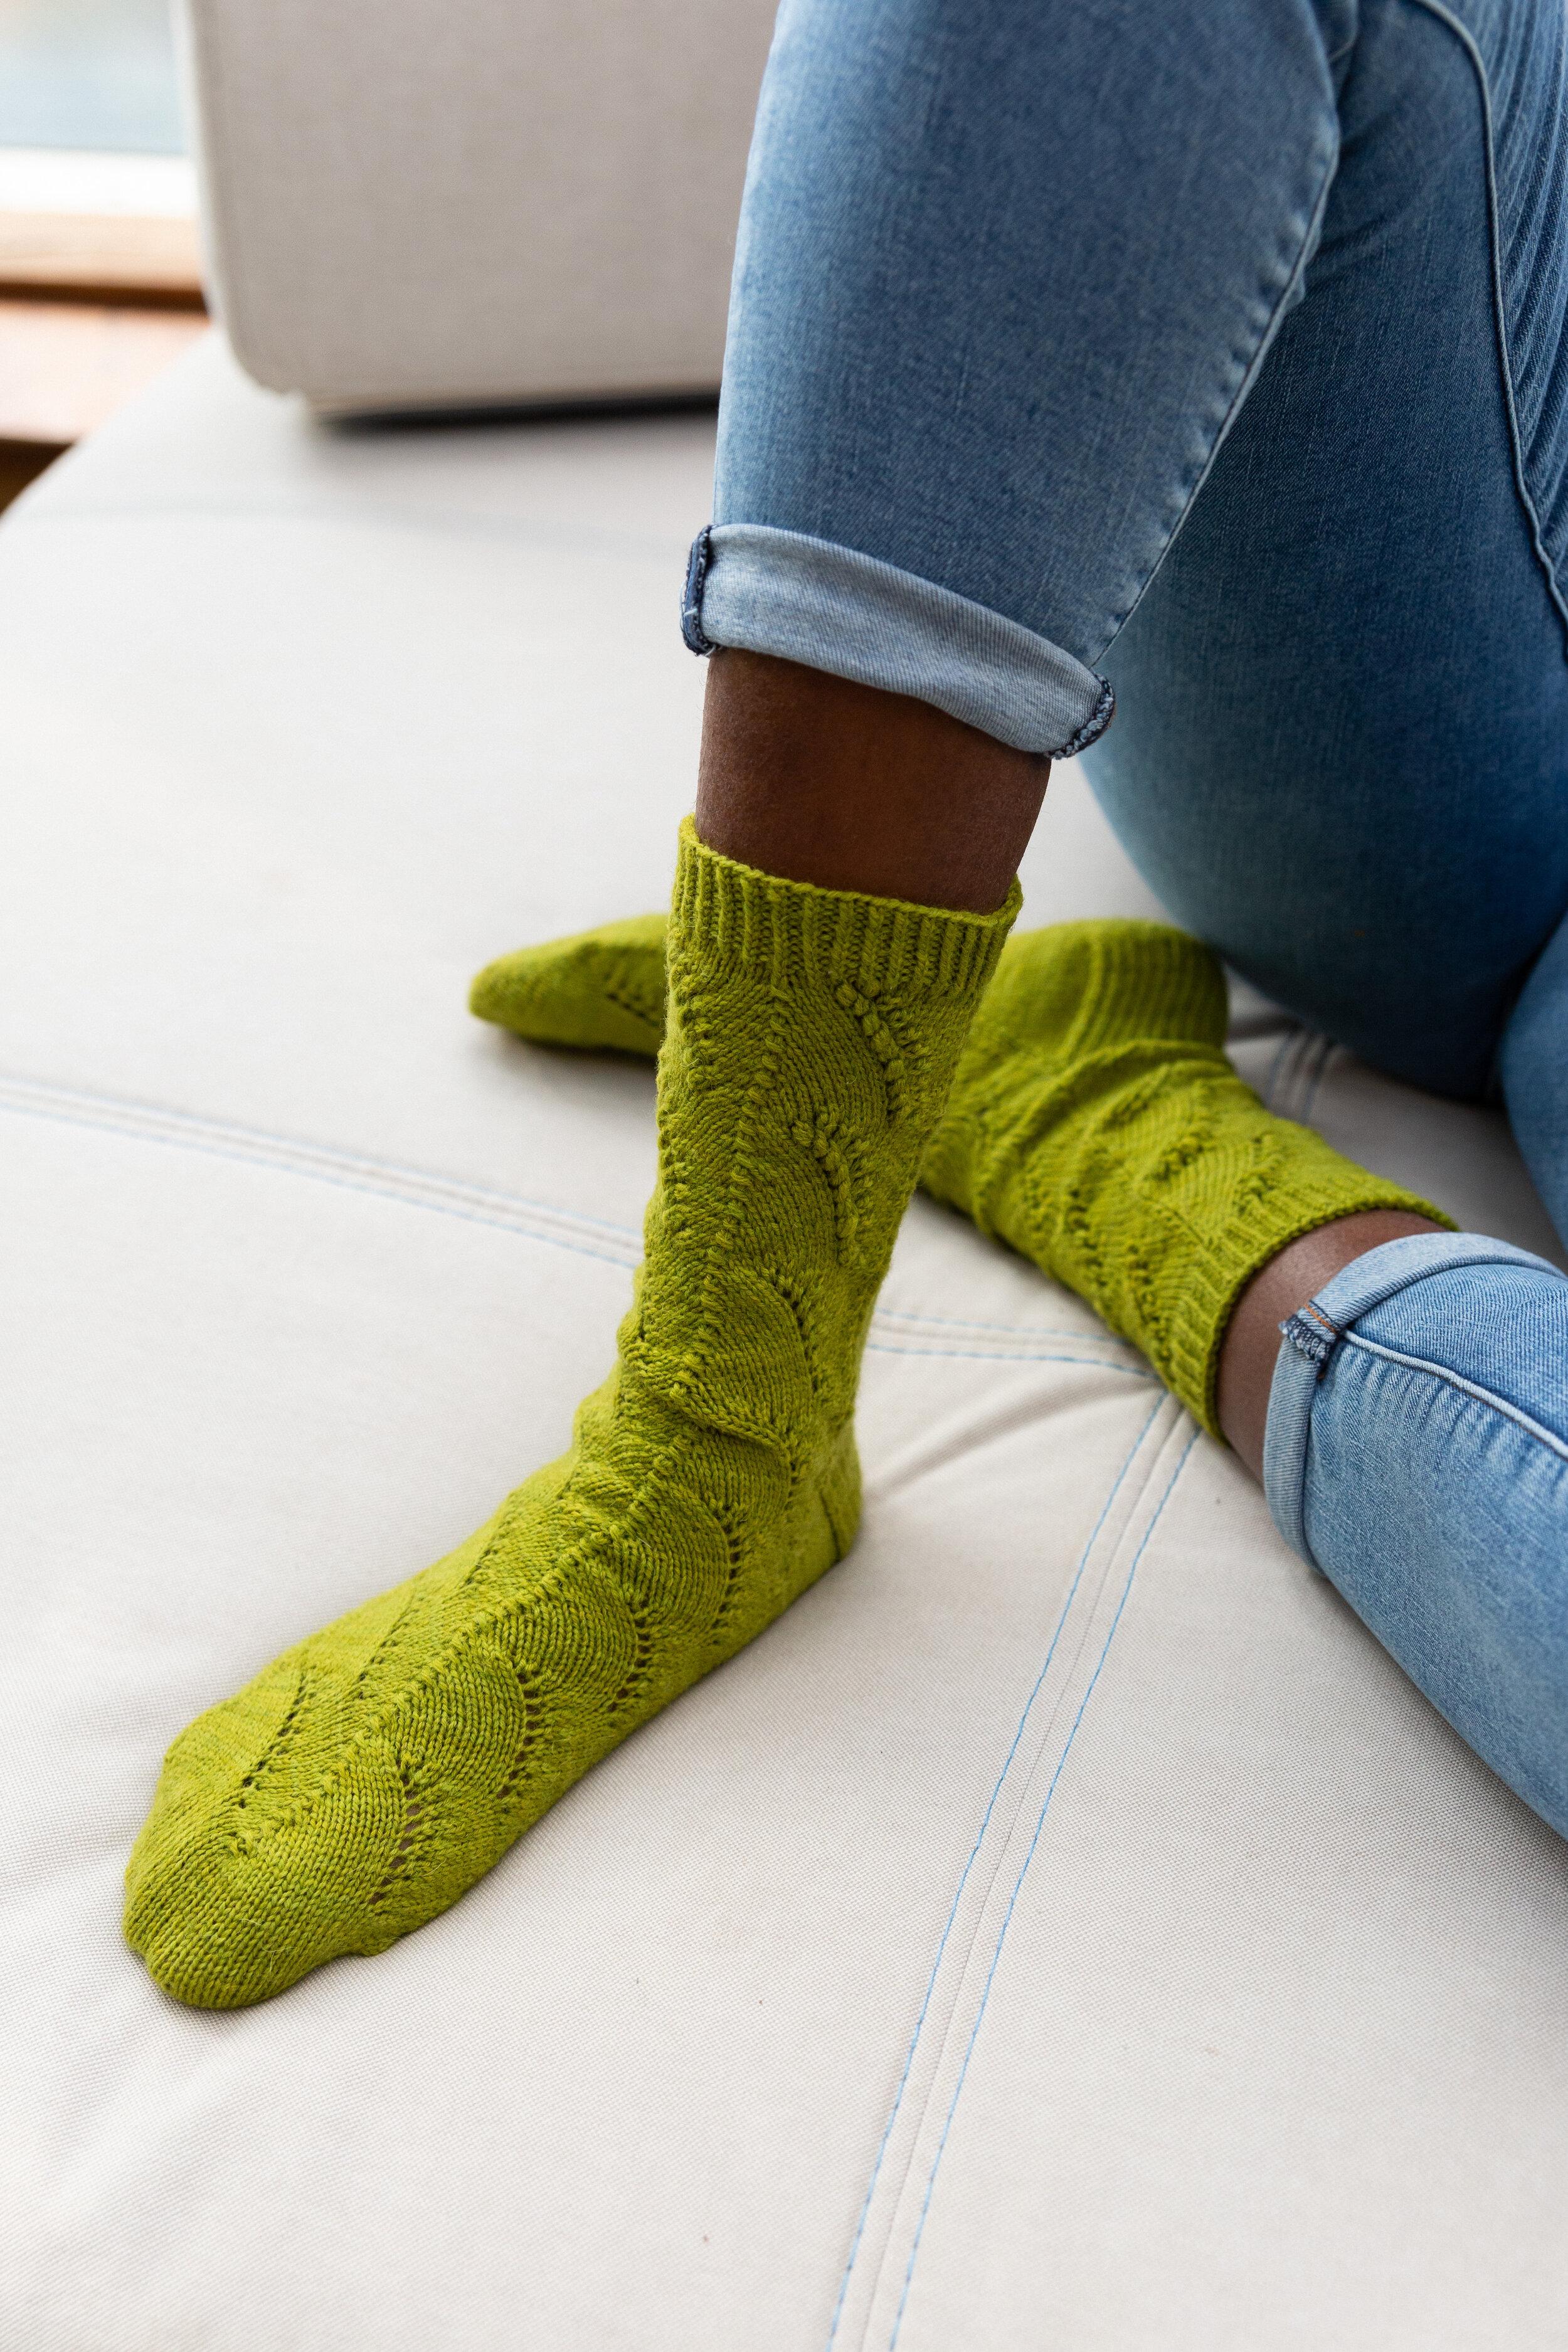 Wild Grass Socks (Fiona Alice, Issue 5), sample knit in Triskelion Yarn Mama Qucha Sock (Kelp)